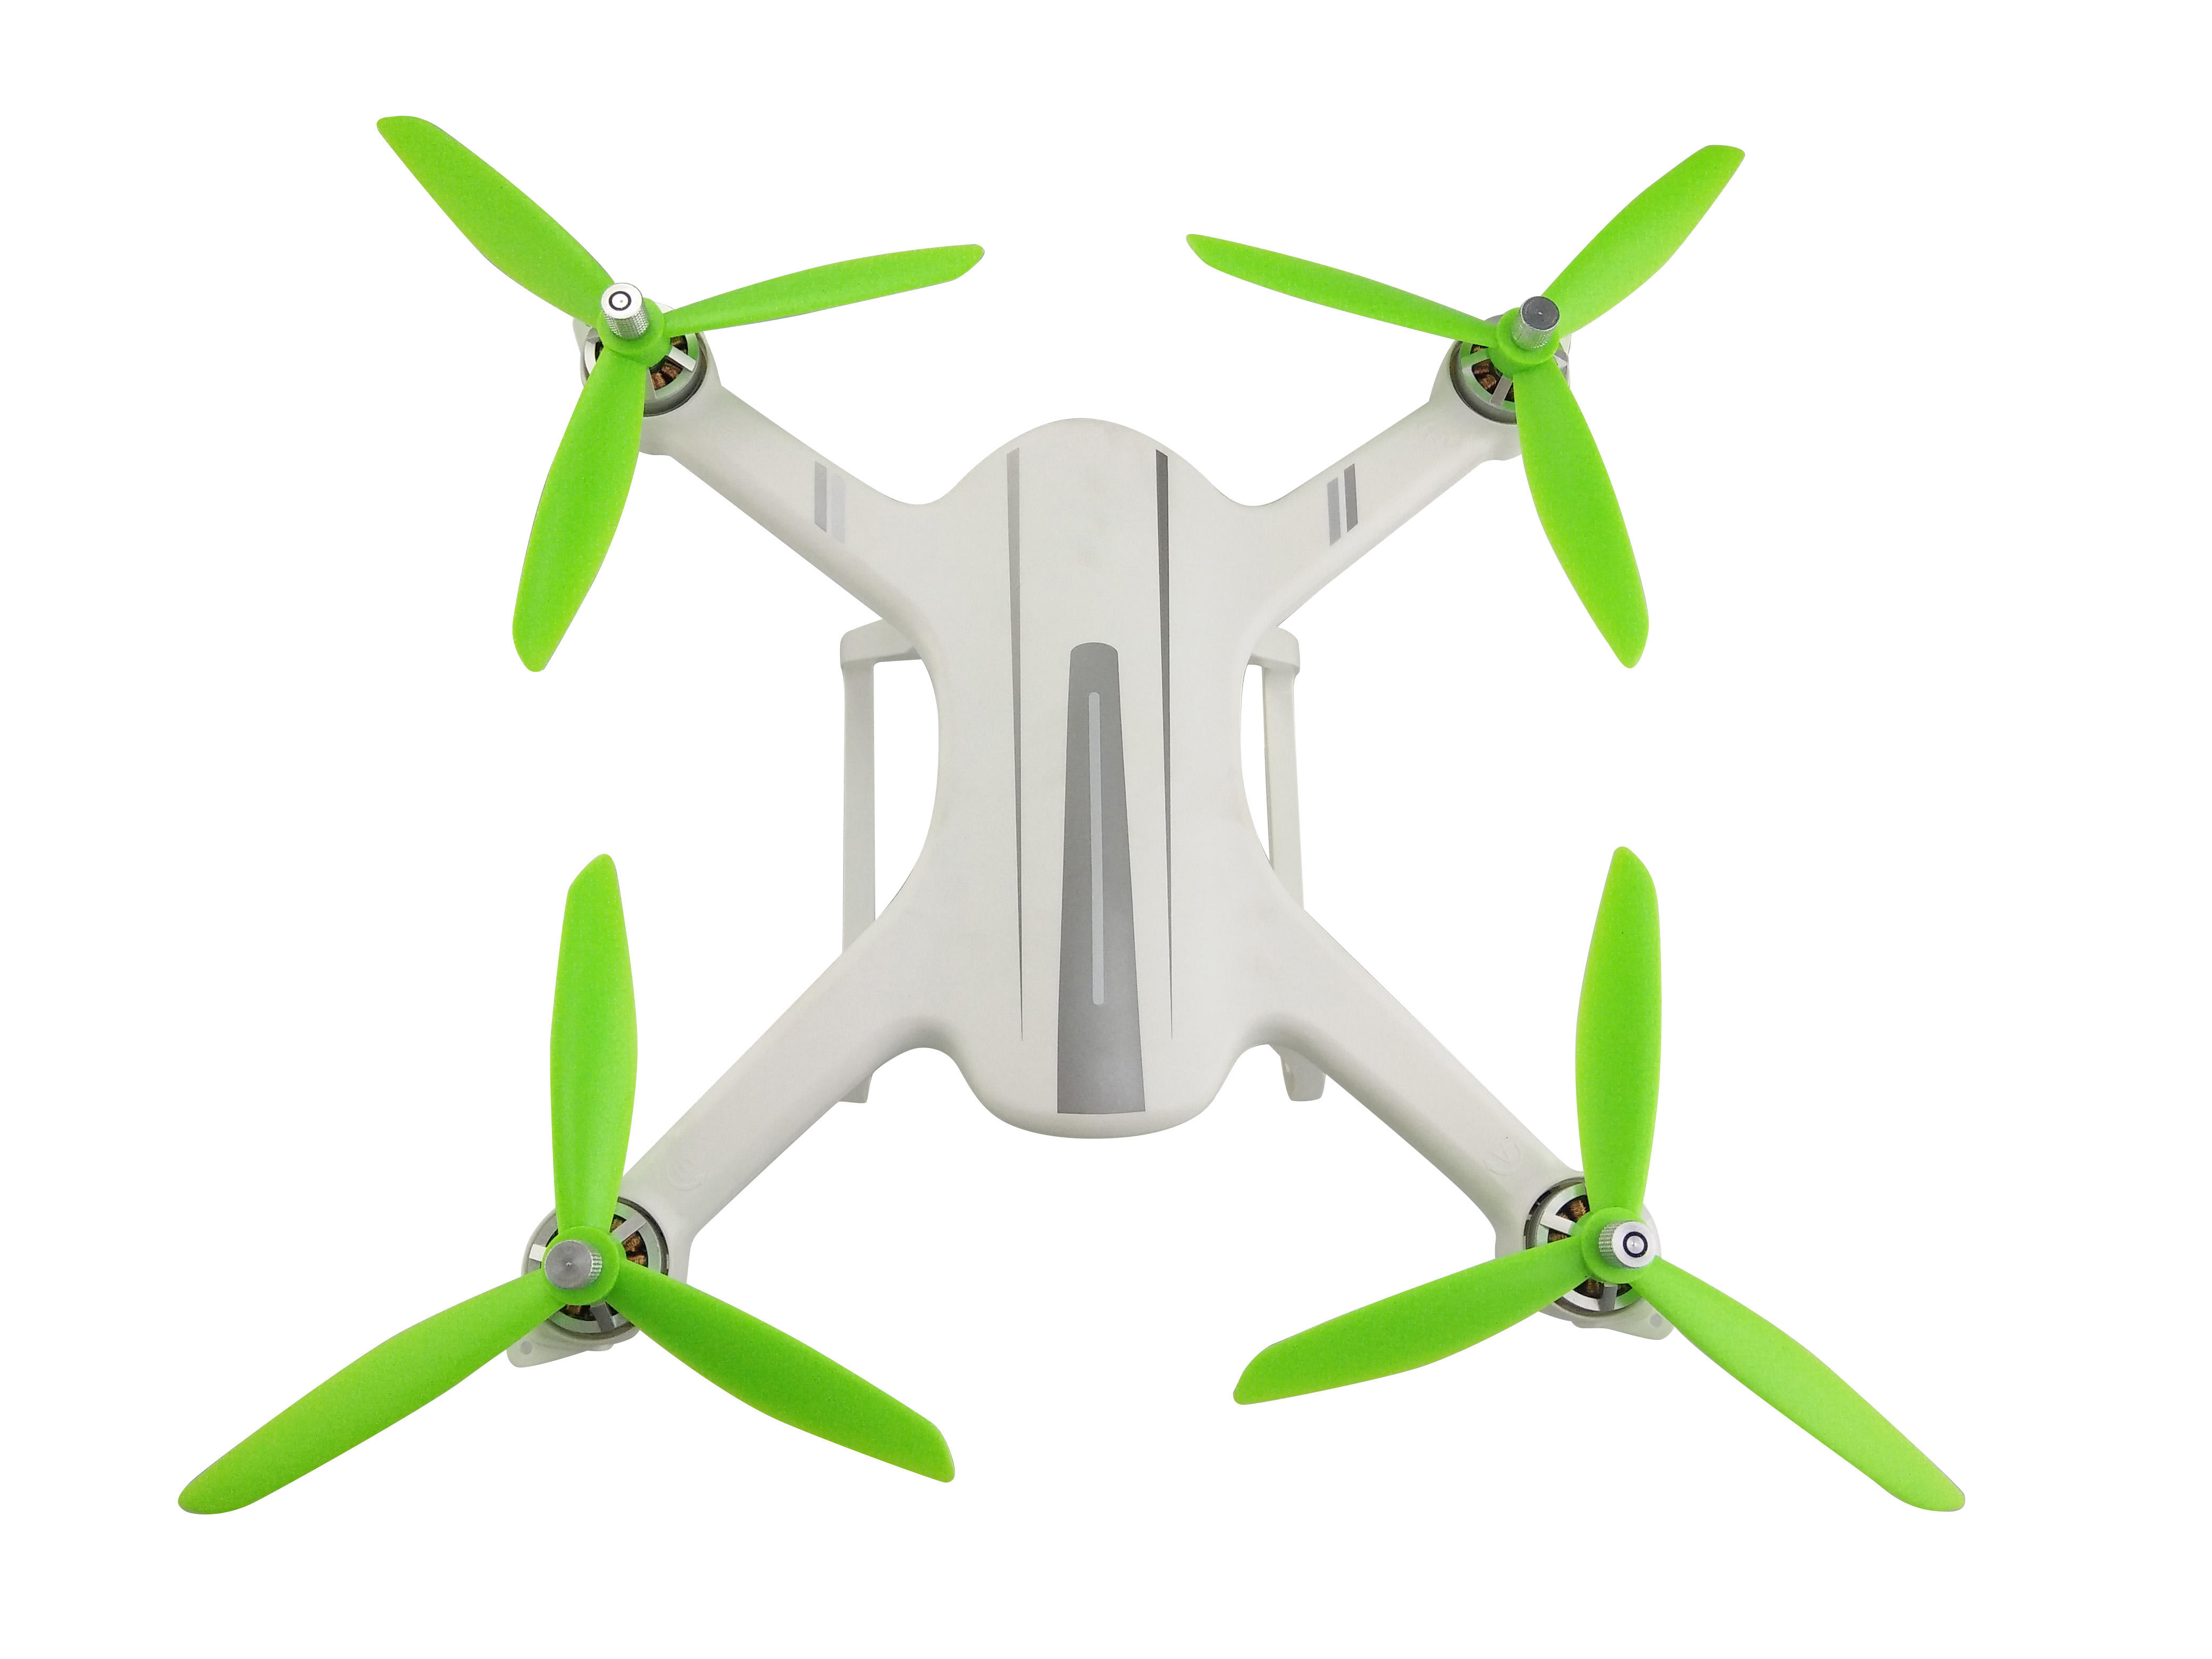 4 Green Blade Propeller for MJX Bugs 3 PRO B3 PRO HS700 Brushless Quadcopter